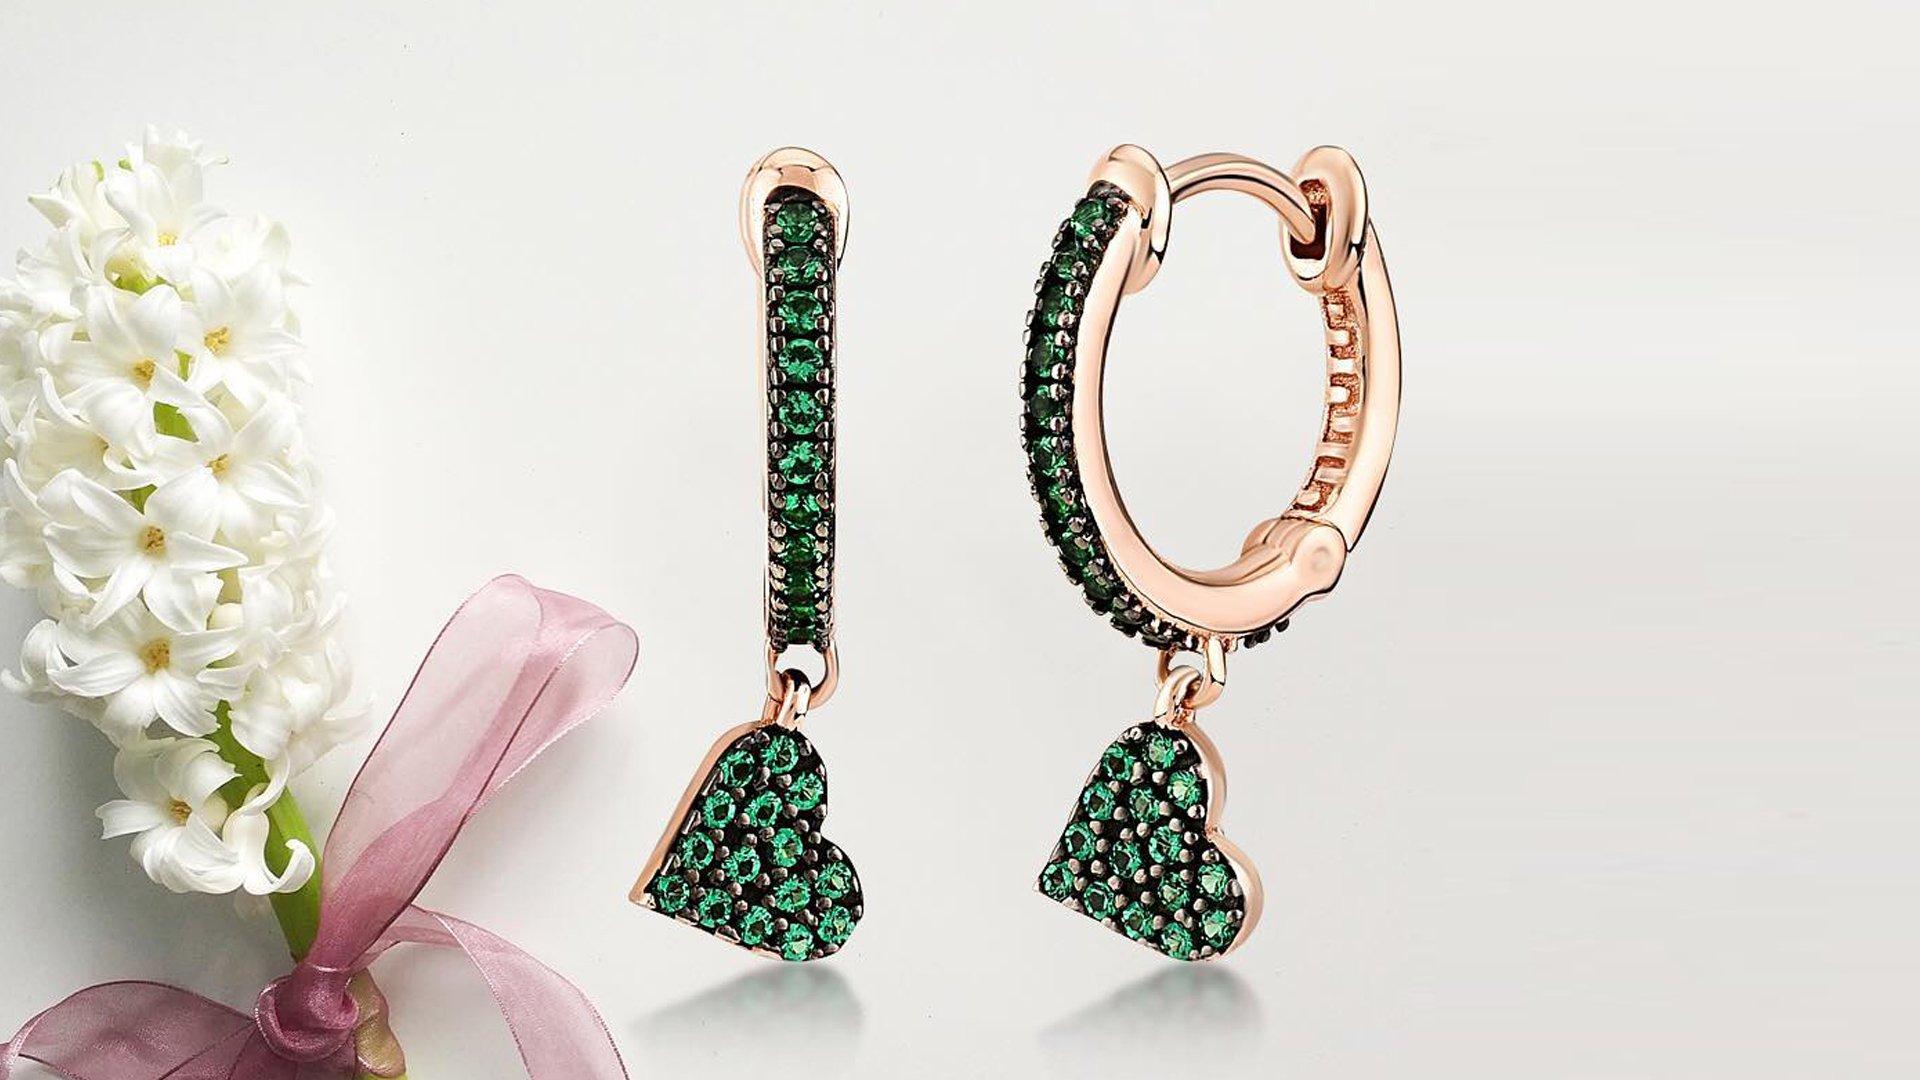 kurshuni jewels, regali, san Valentino, gioielli, orecchini smeraldi,